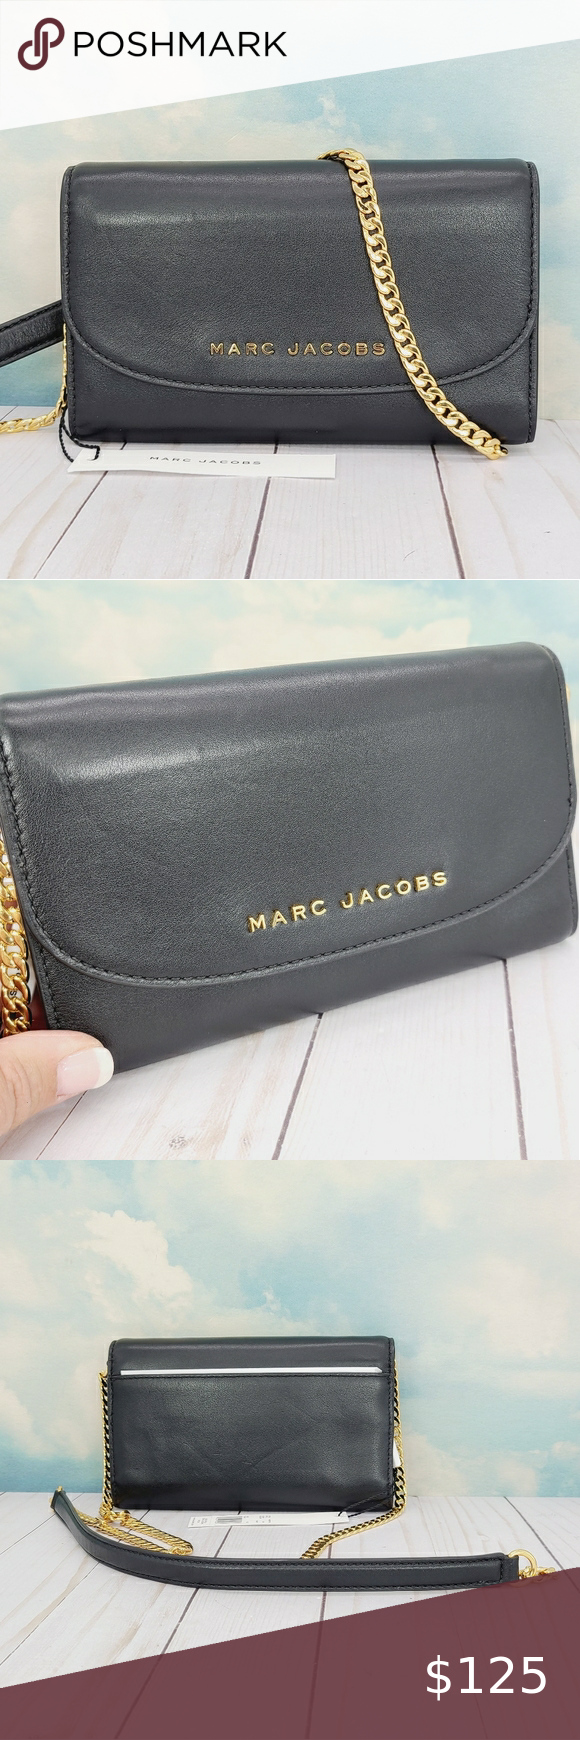 Marc Jacobs Avenue Wallet Crossbody Bag In 2020 Quilted Crossbody Bag Crossbody Bag Marc Jacobs Crossbody Bag